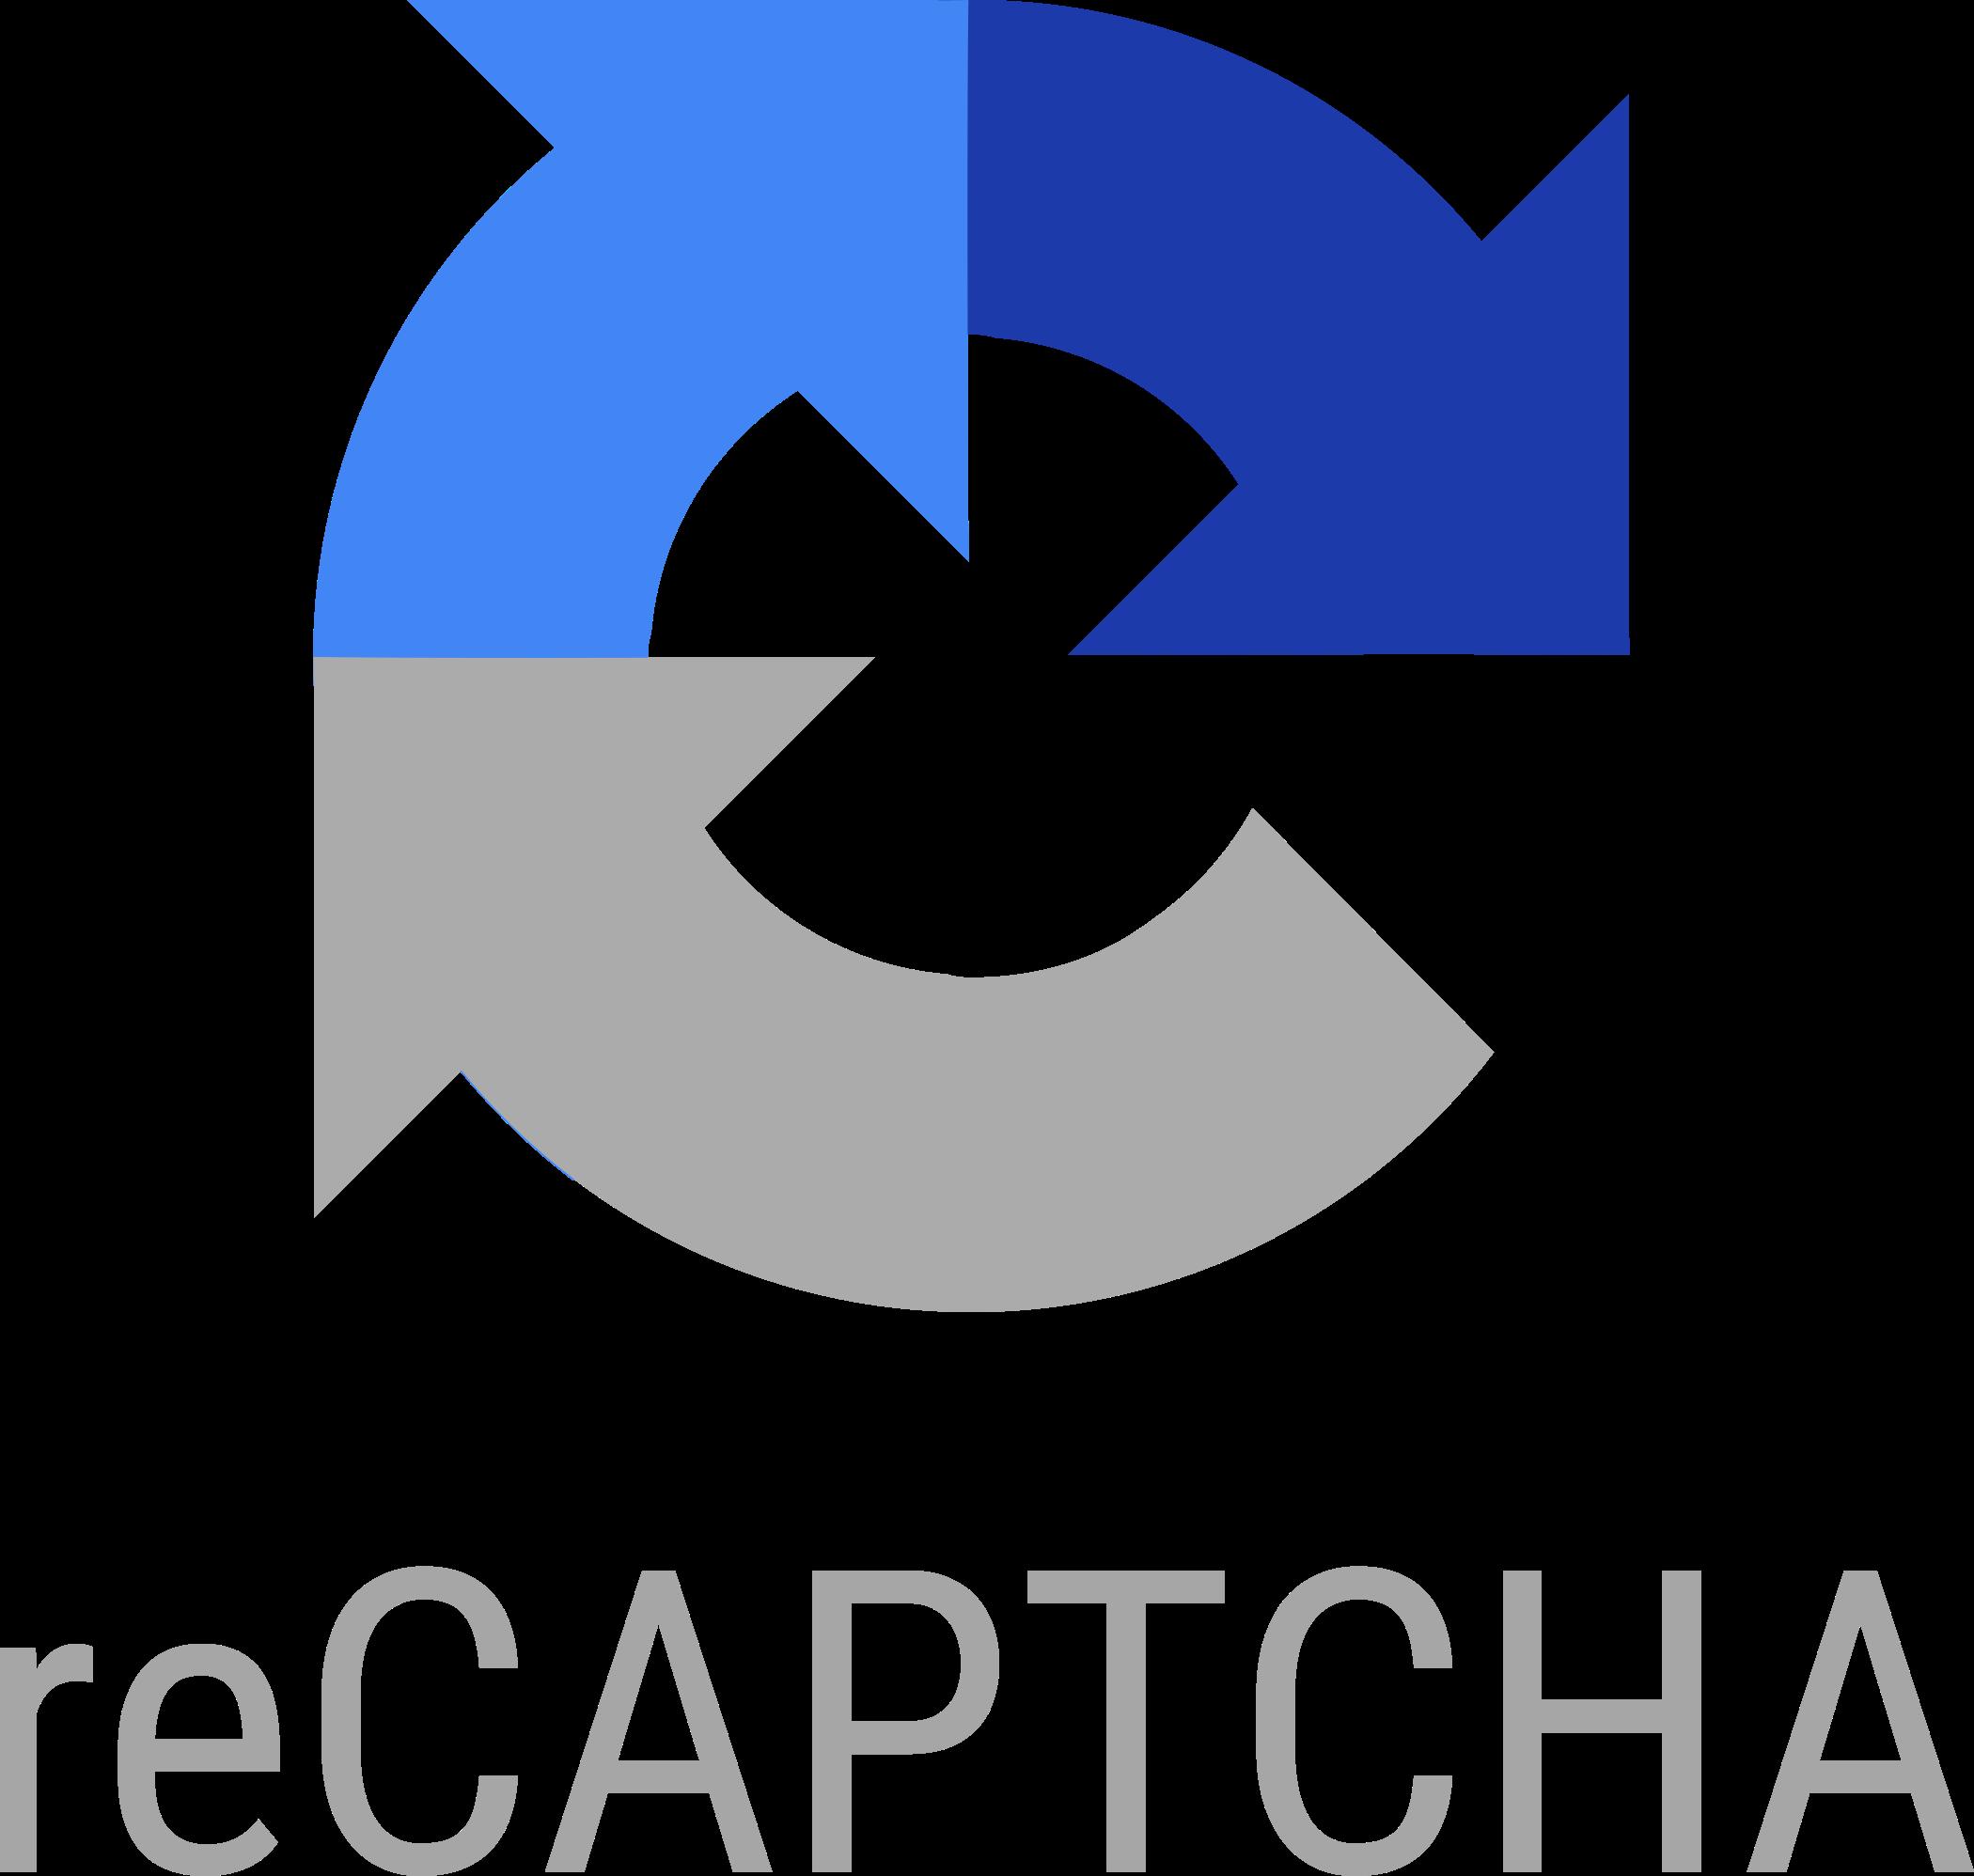 recaptcha logo 1 - reCAPTCHA Logo